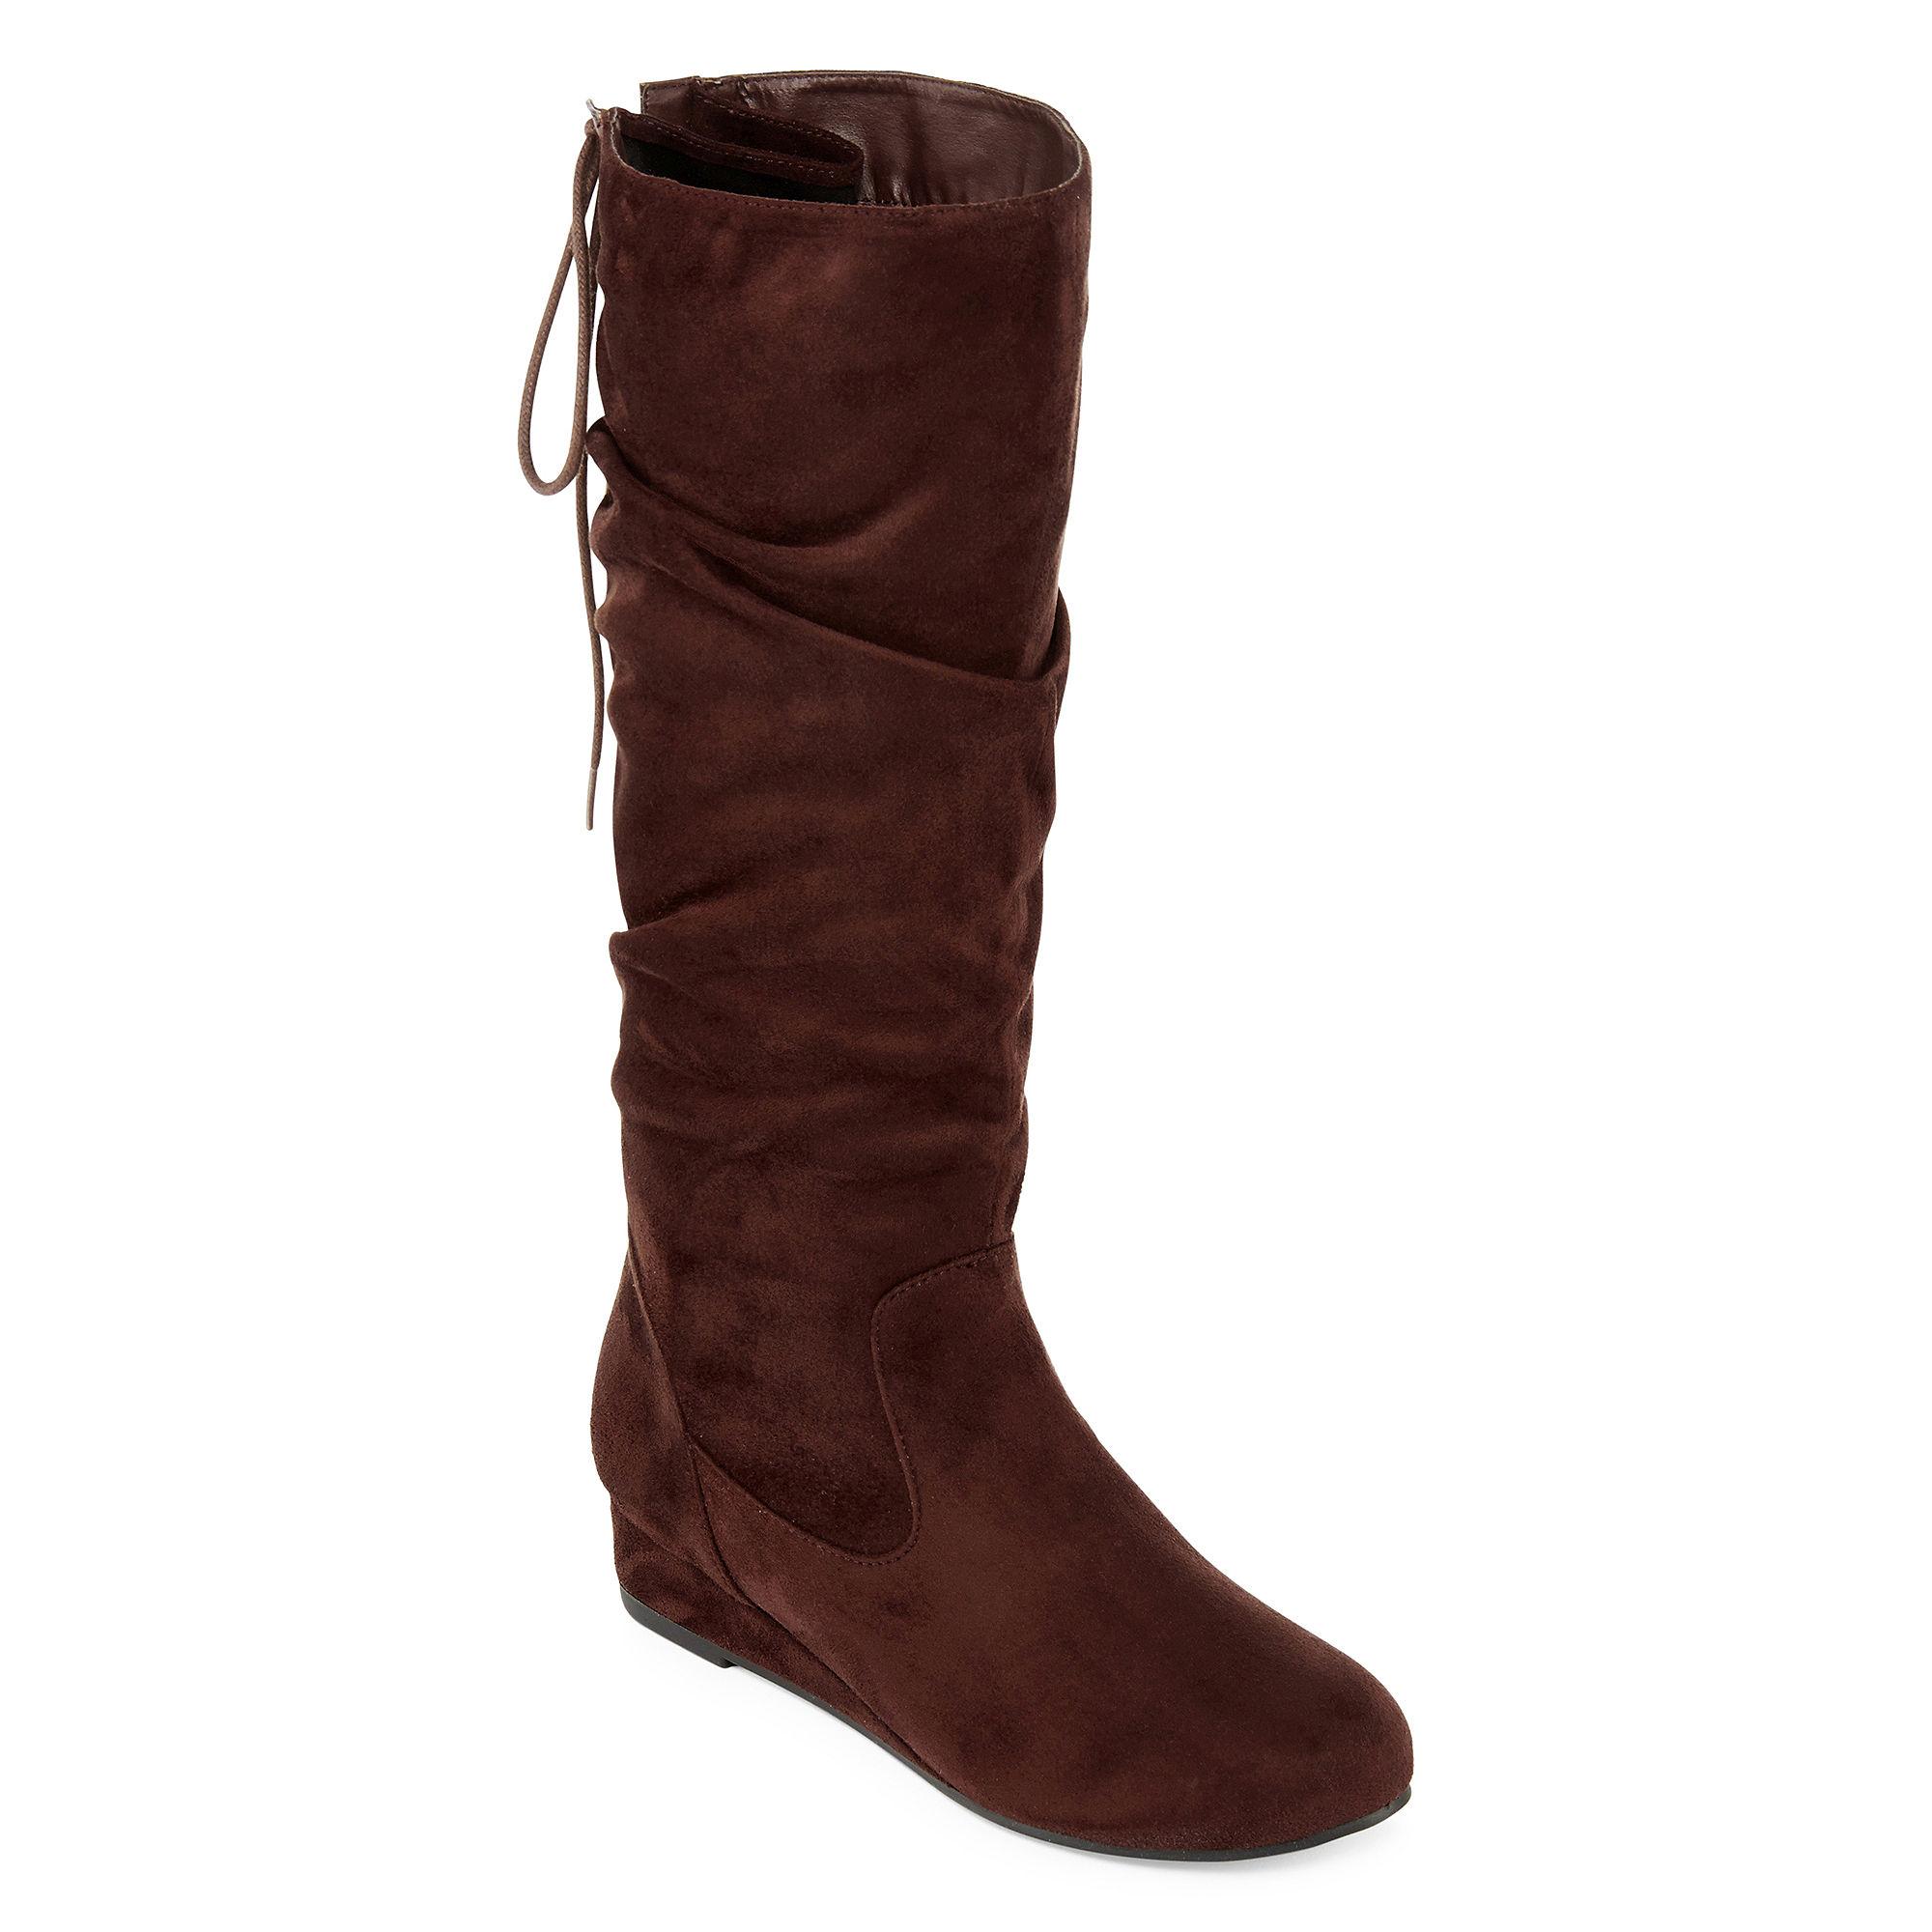 Women's Boots Under $50…